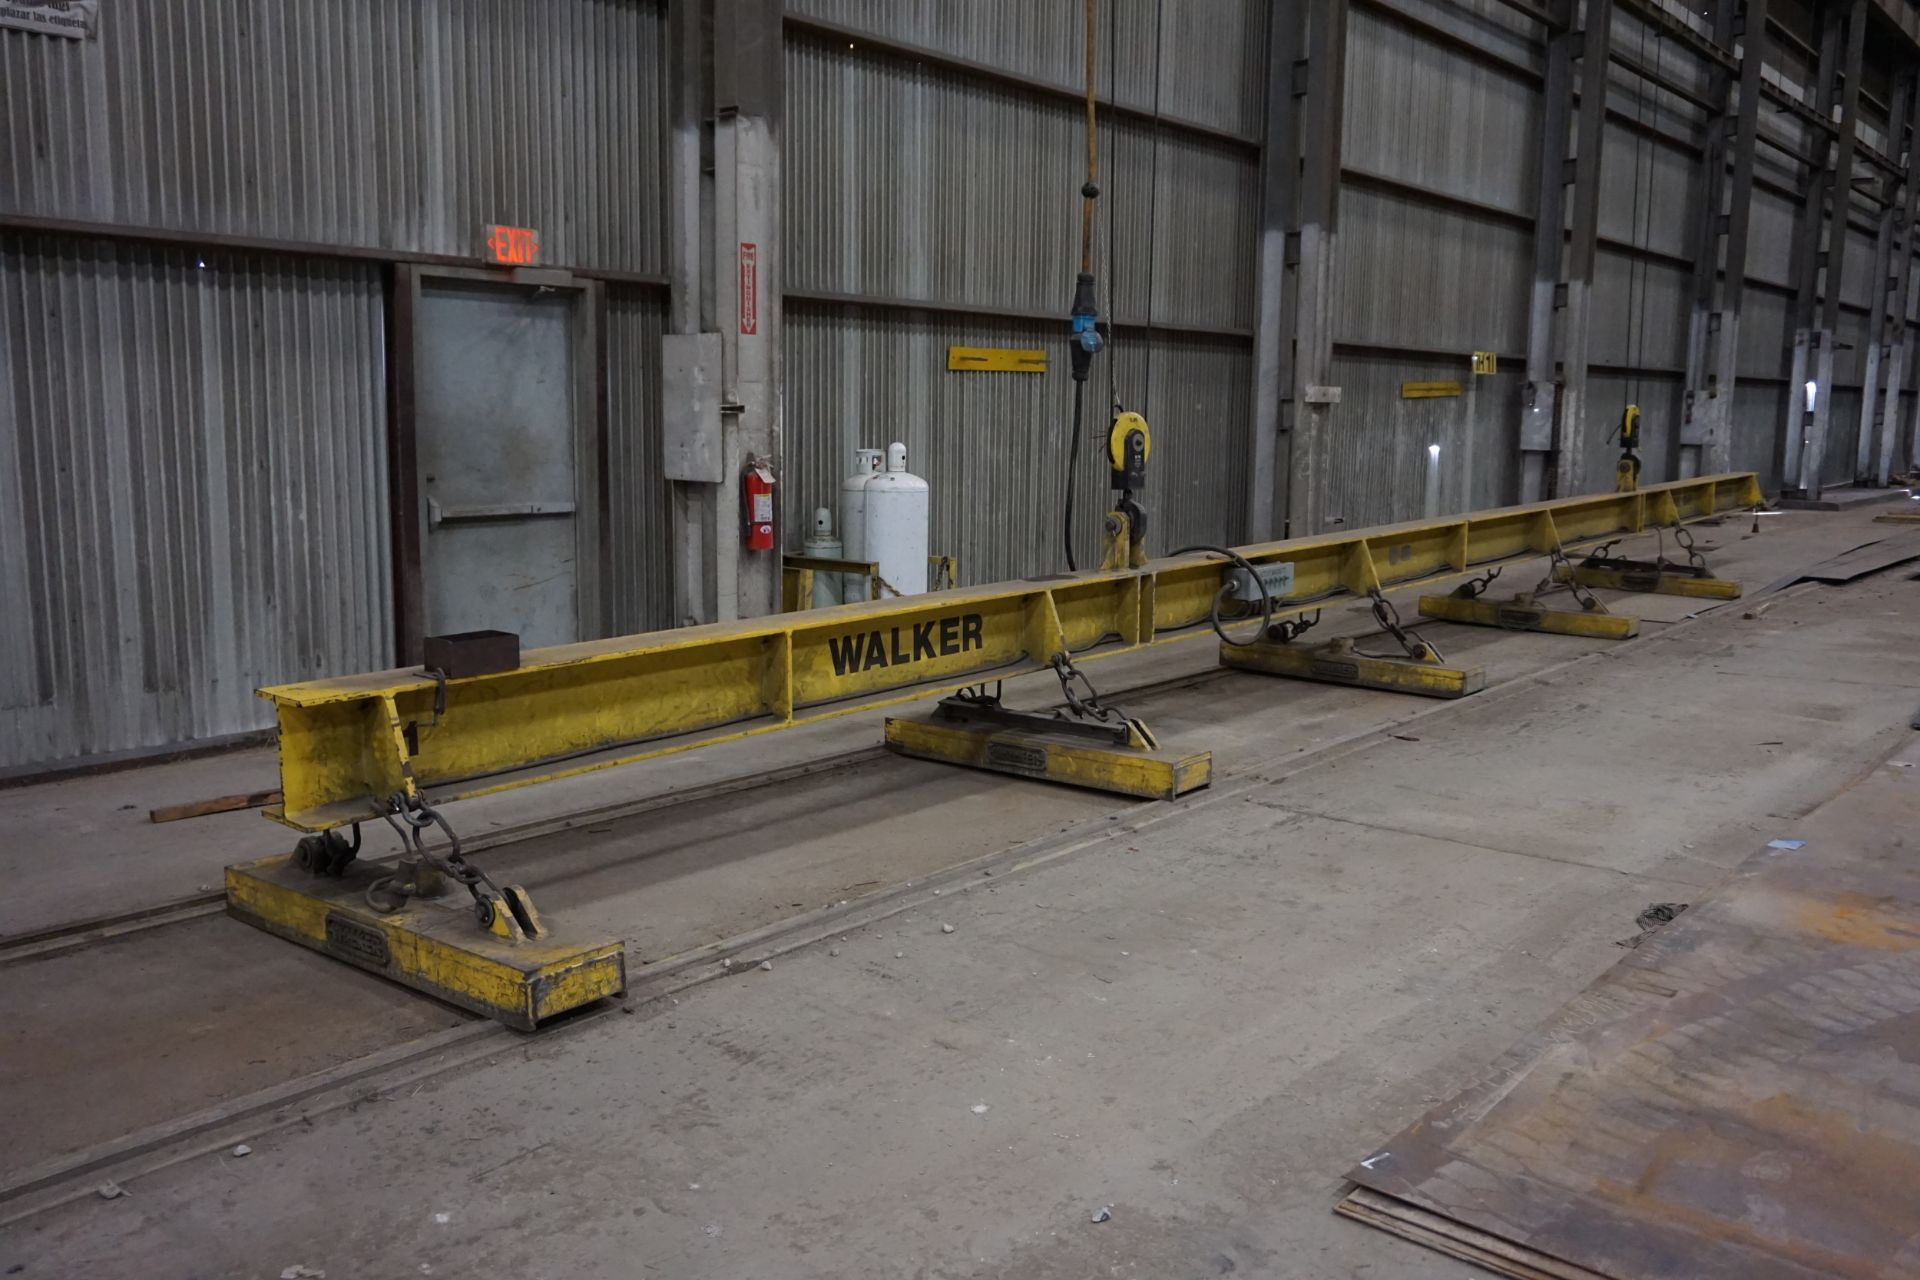 Lot 103 - WALKER MAGNETIC SHEET LIFTER (FORT WORTH, TX)